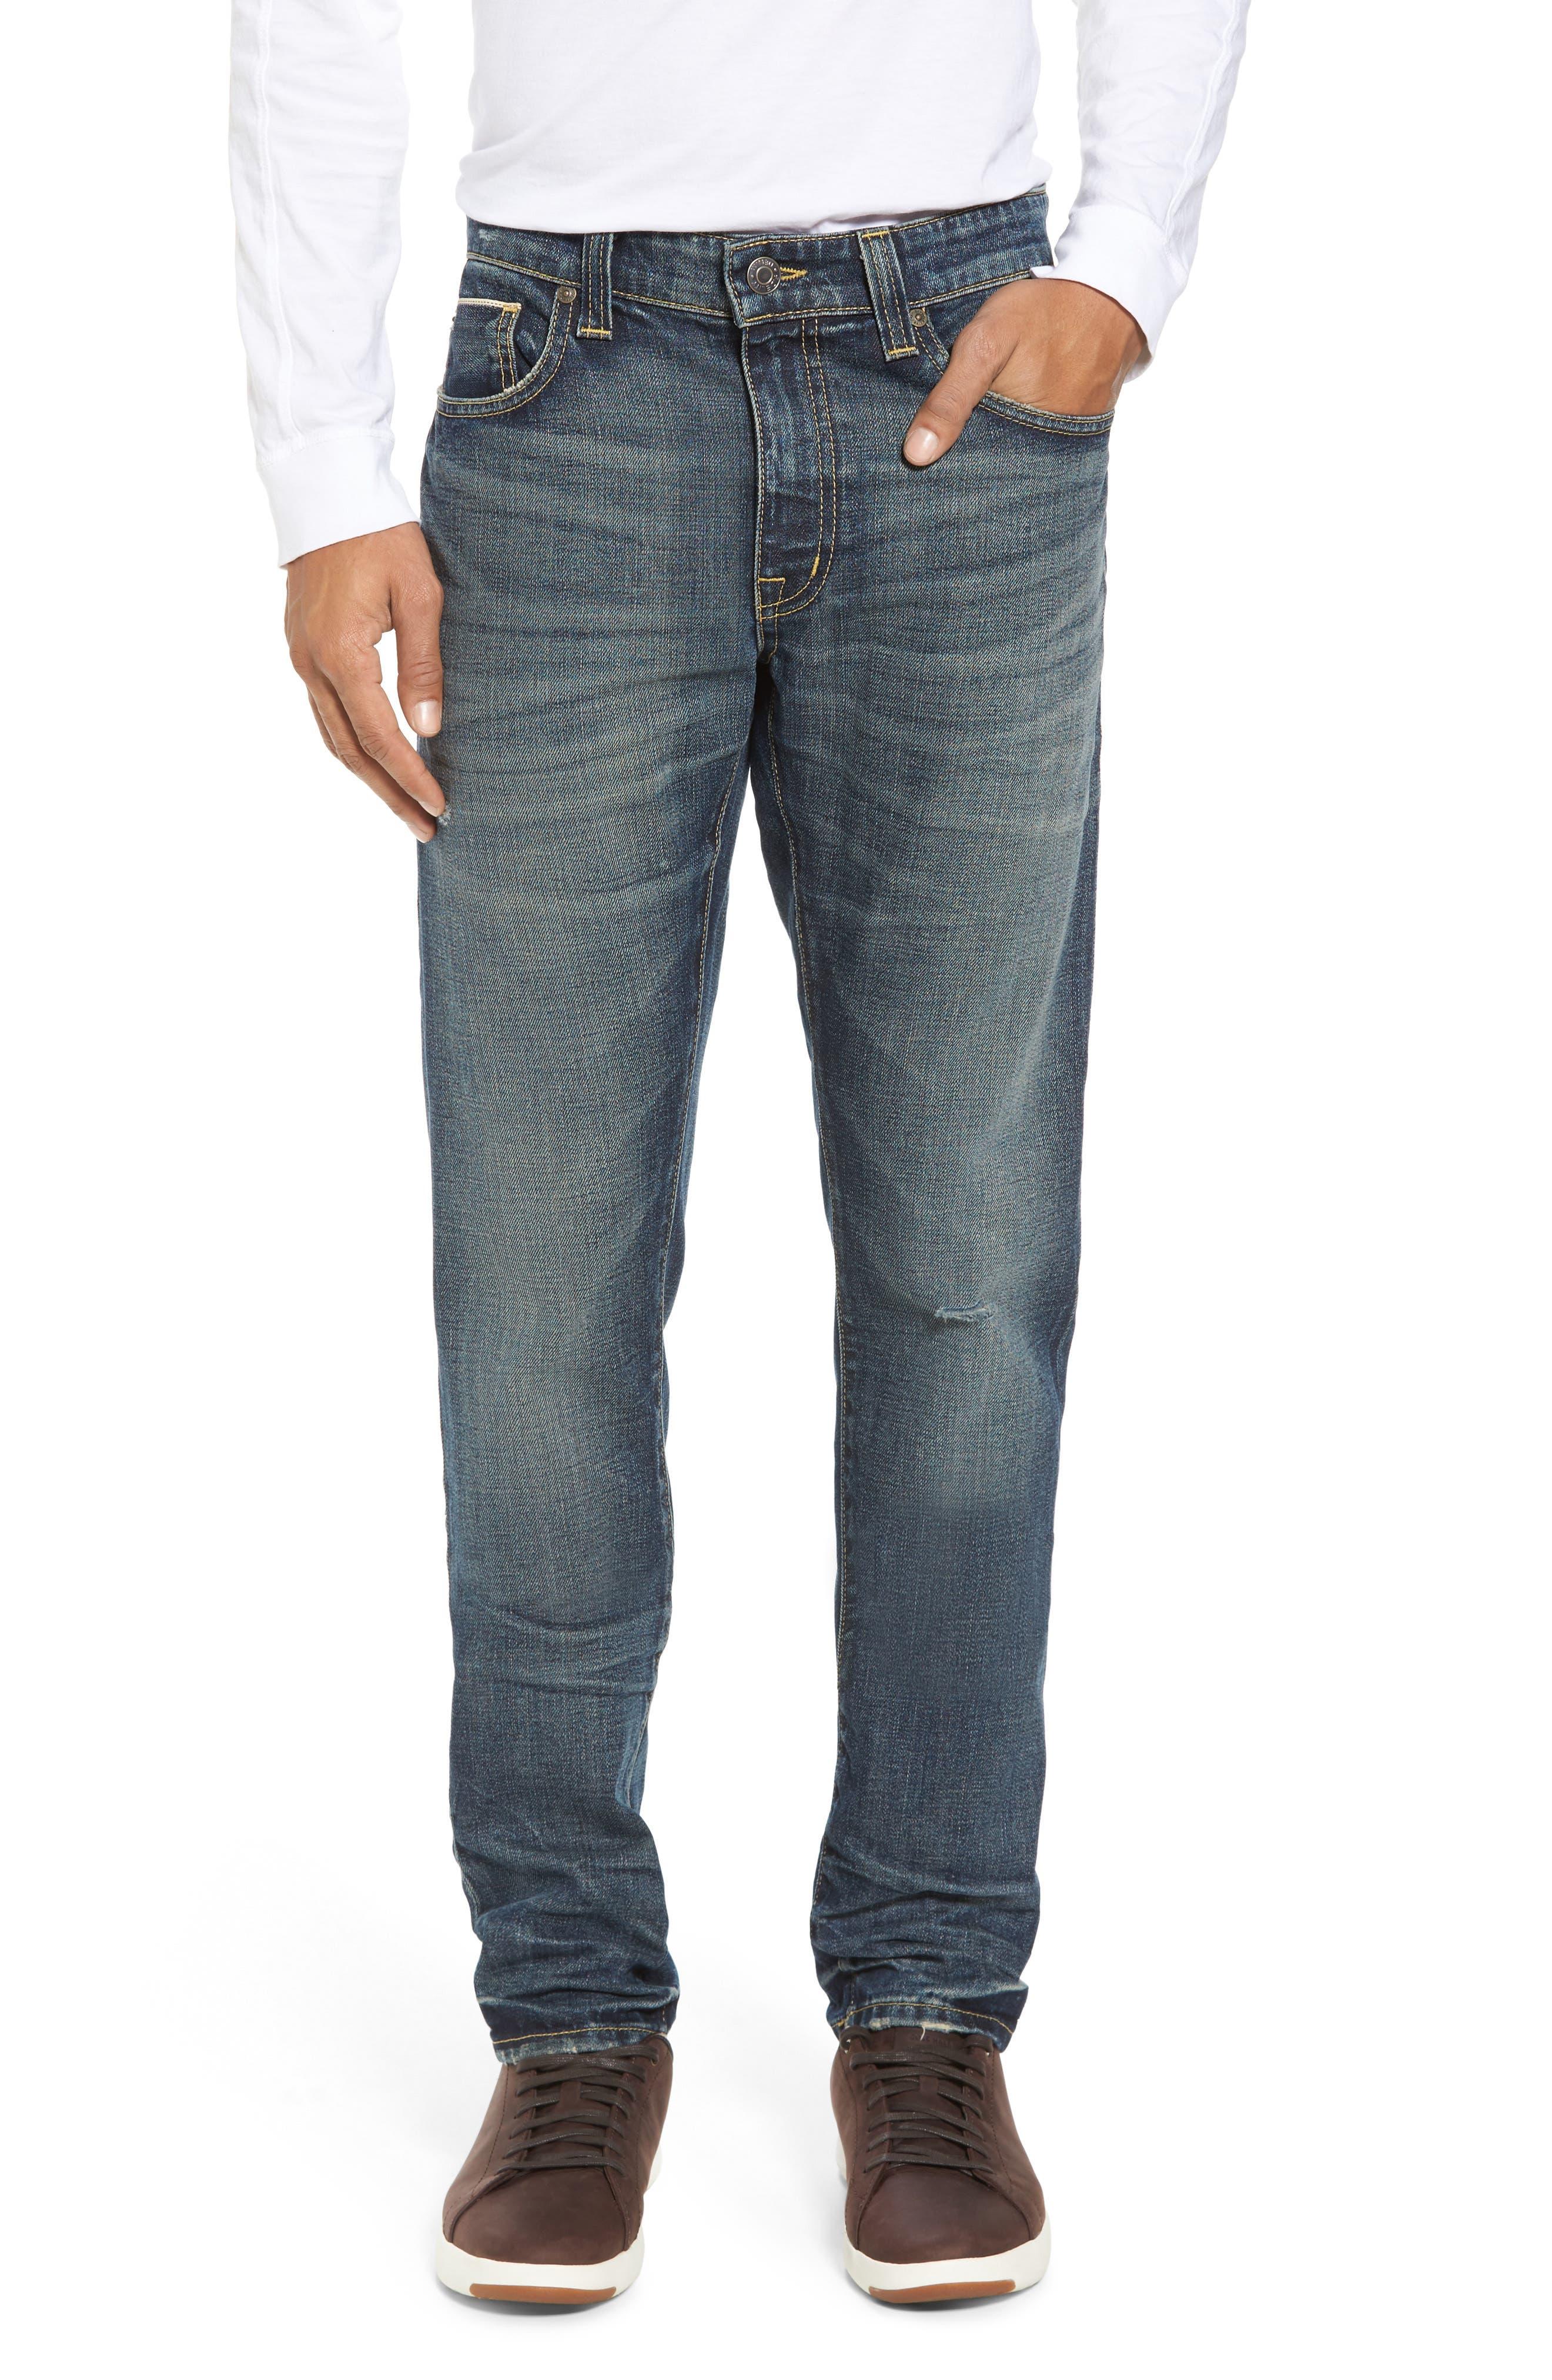 Fideltiy Denim Torino Slim Fit Jeans,                             Main thumbnail 1, color,                             Crystal Blue